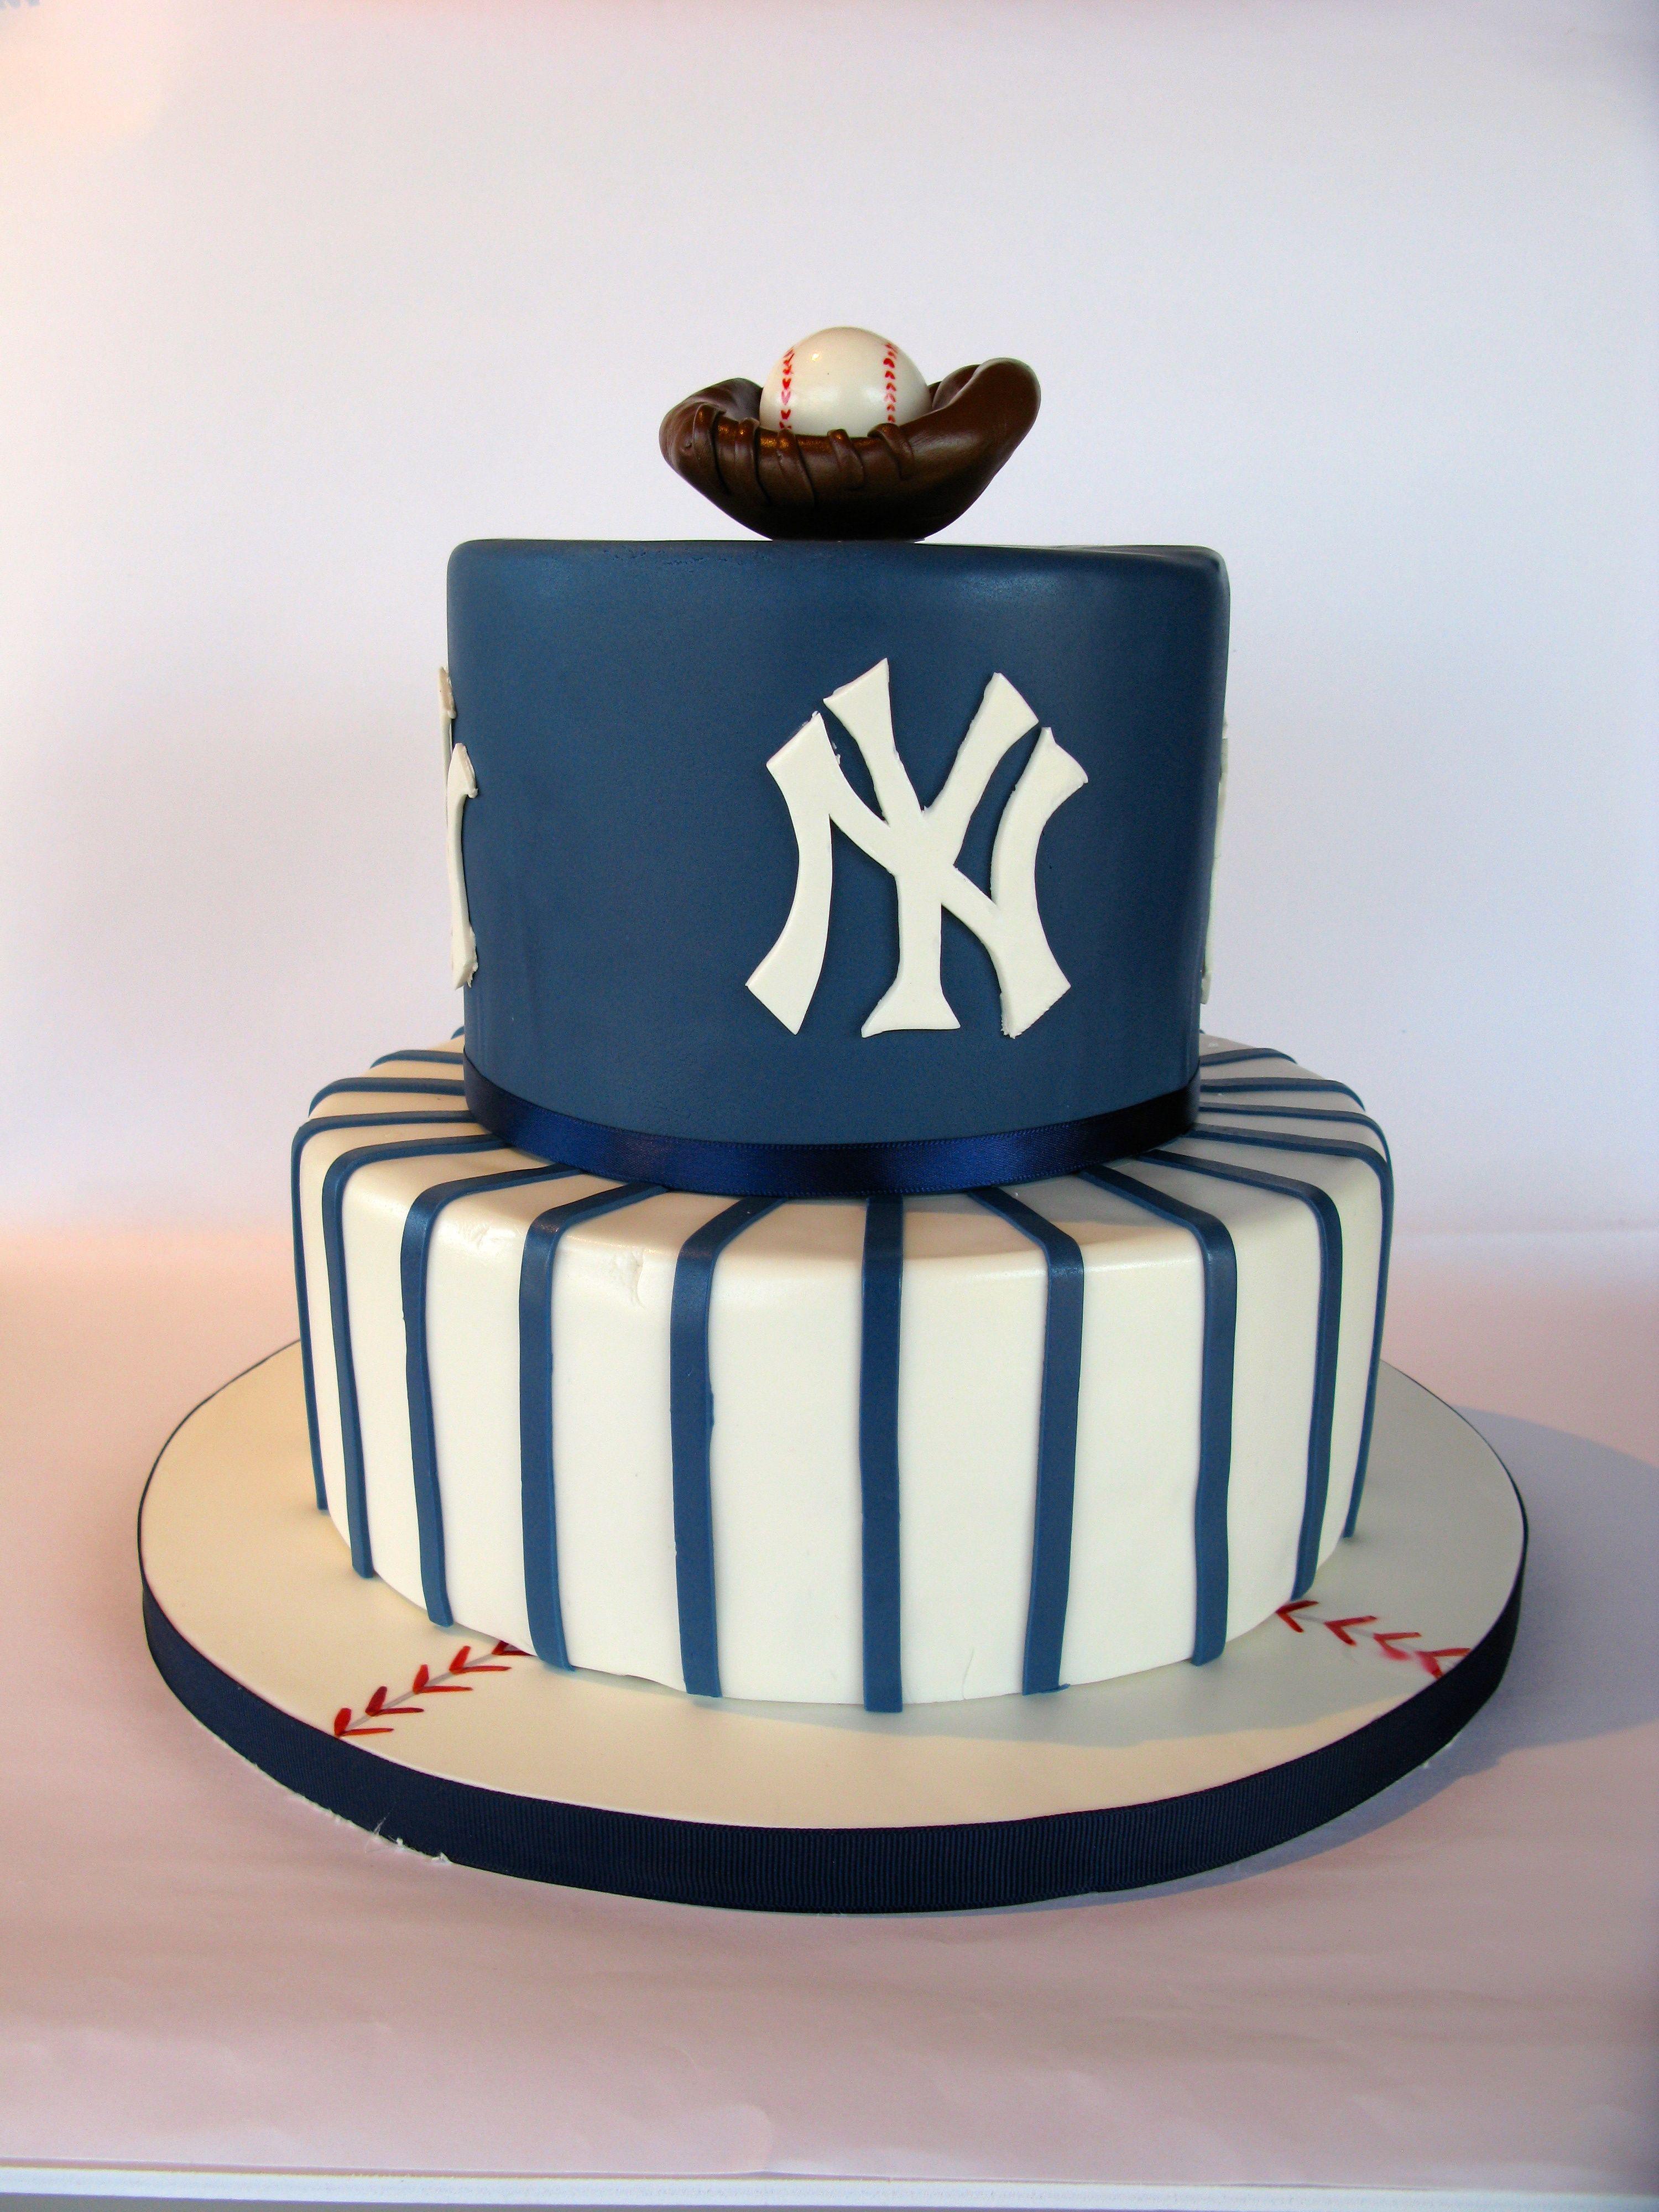 Pin By Sin On Groom S Cakes Birthday Cake Kids Boy Birthday Cake Rehearsal Dinner Cake